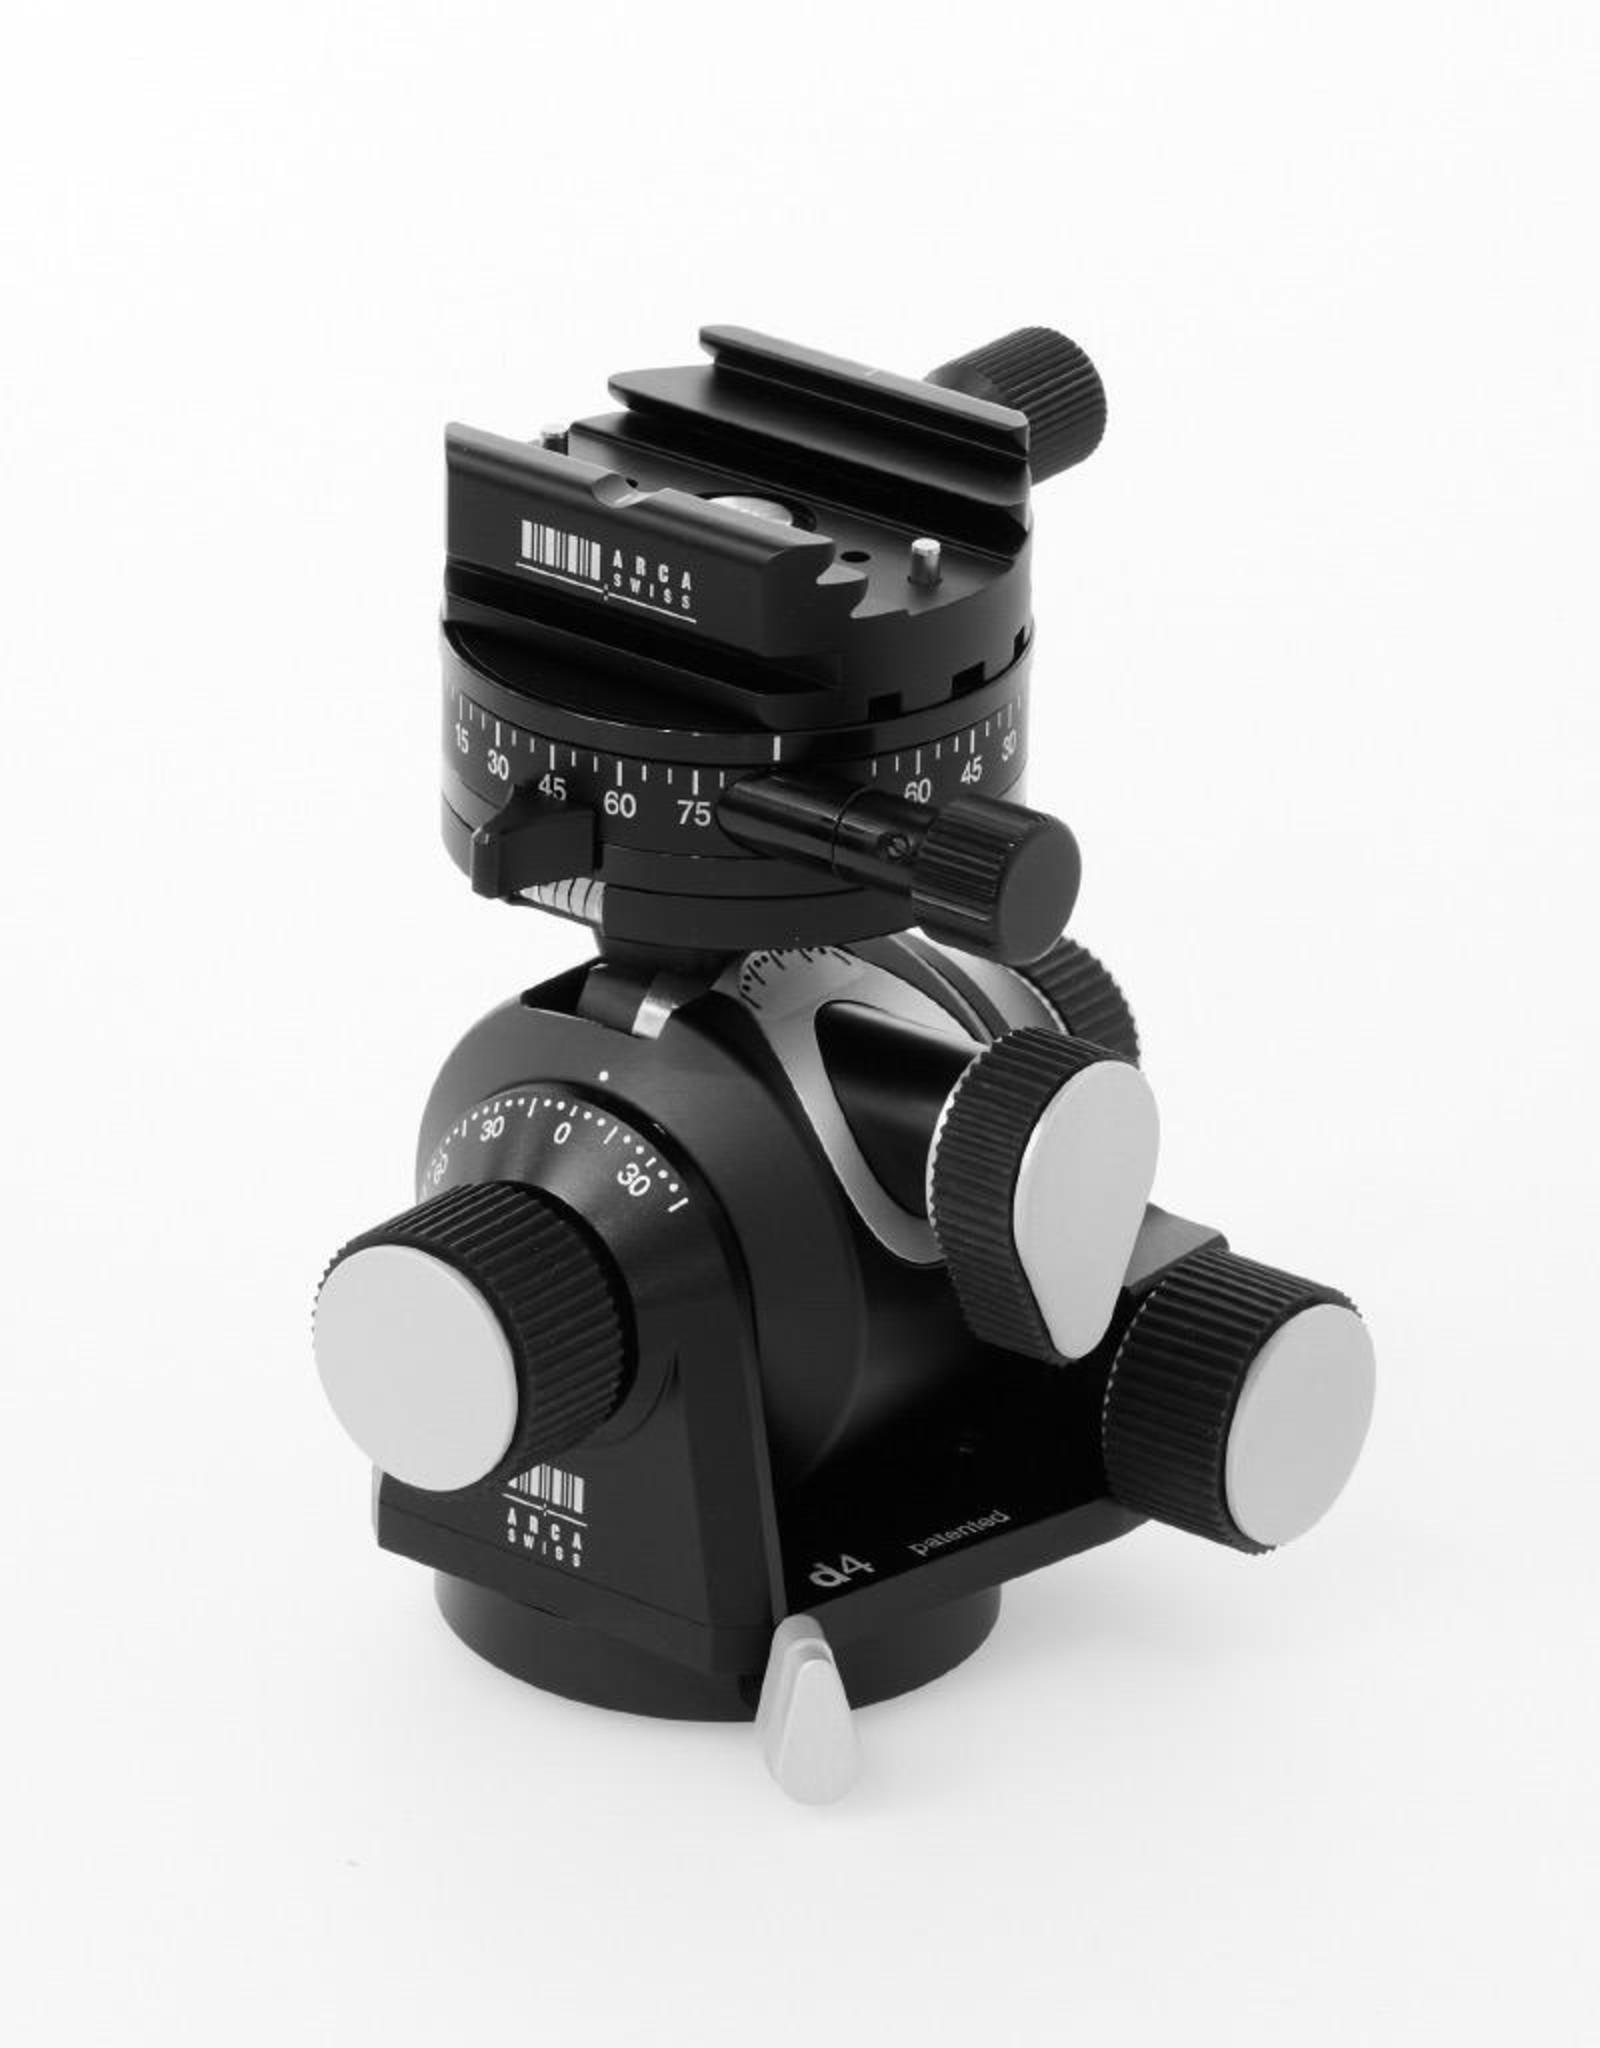 Arca Swiss ARCA-SWISS D4 (geared) gp (geared panning), quick set device Classic